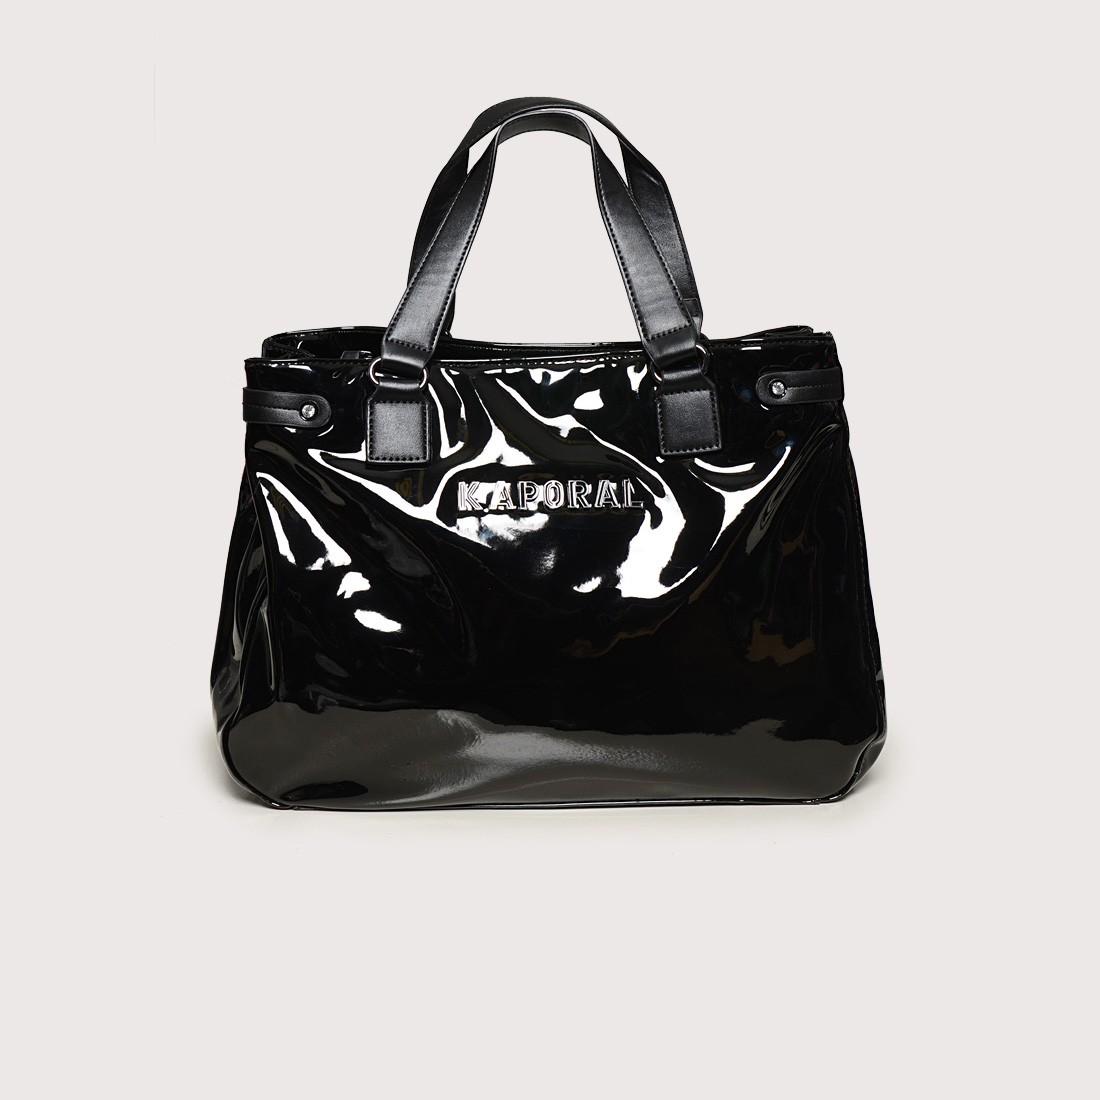 sac kaporal femme noir